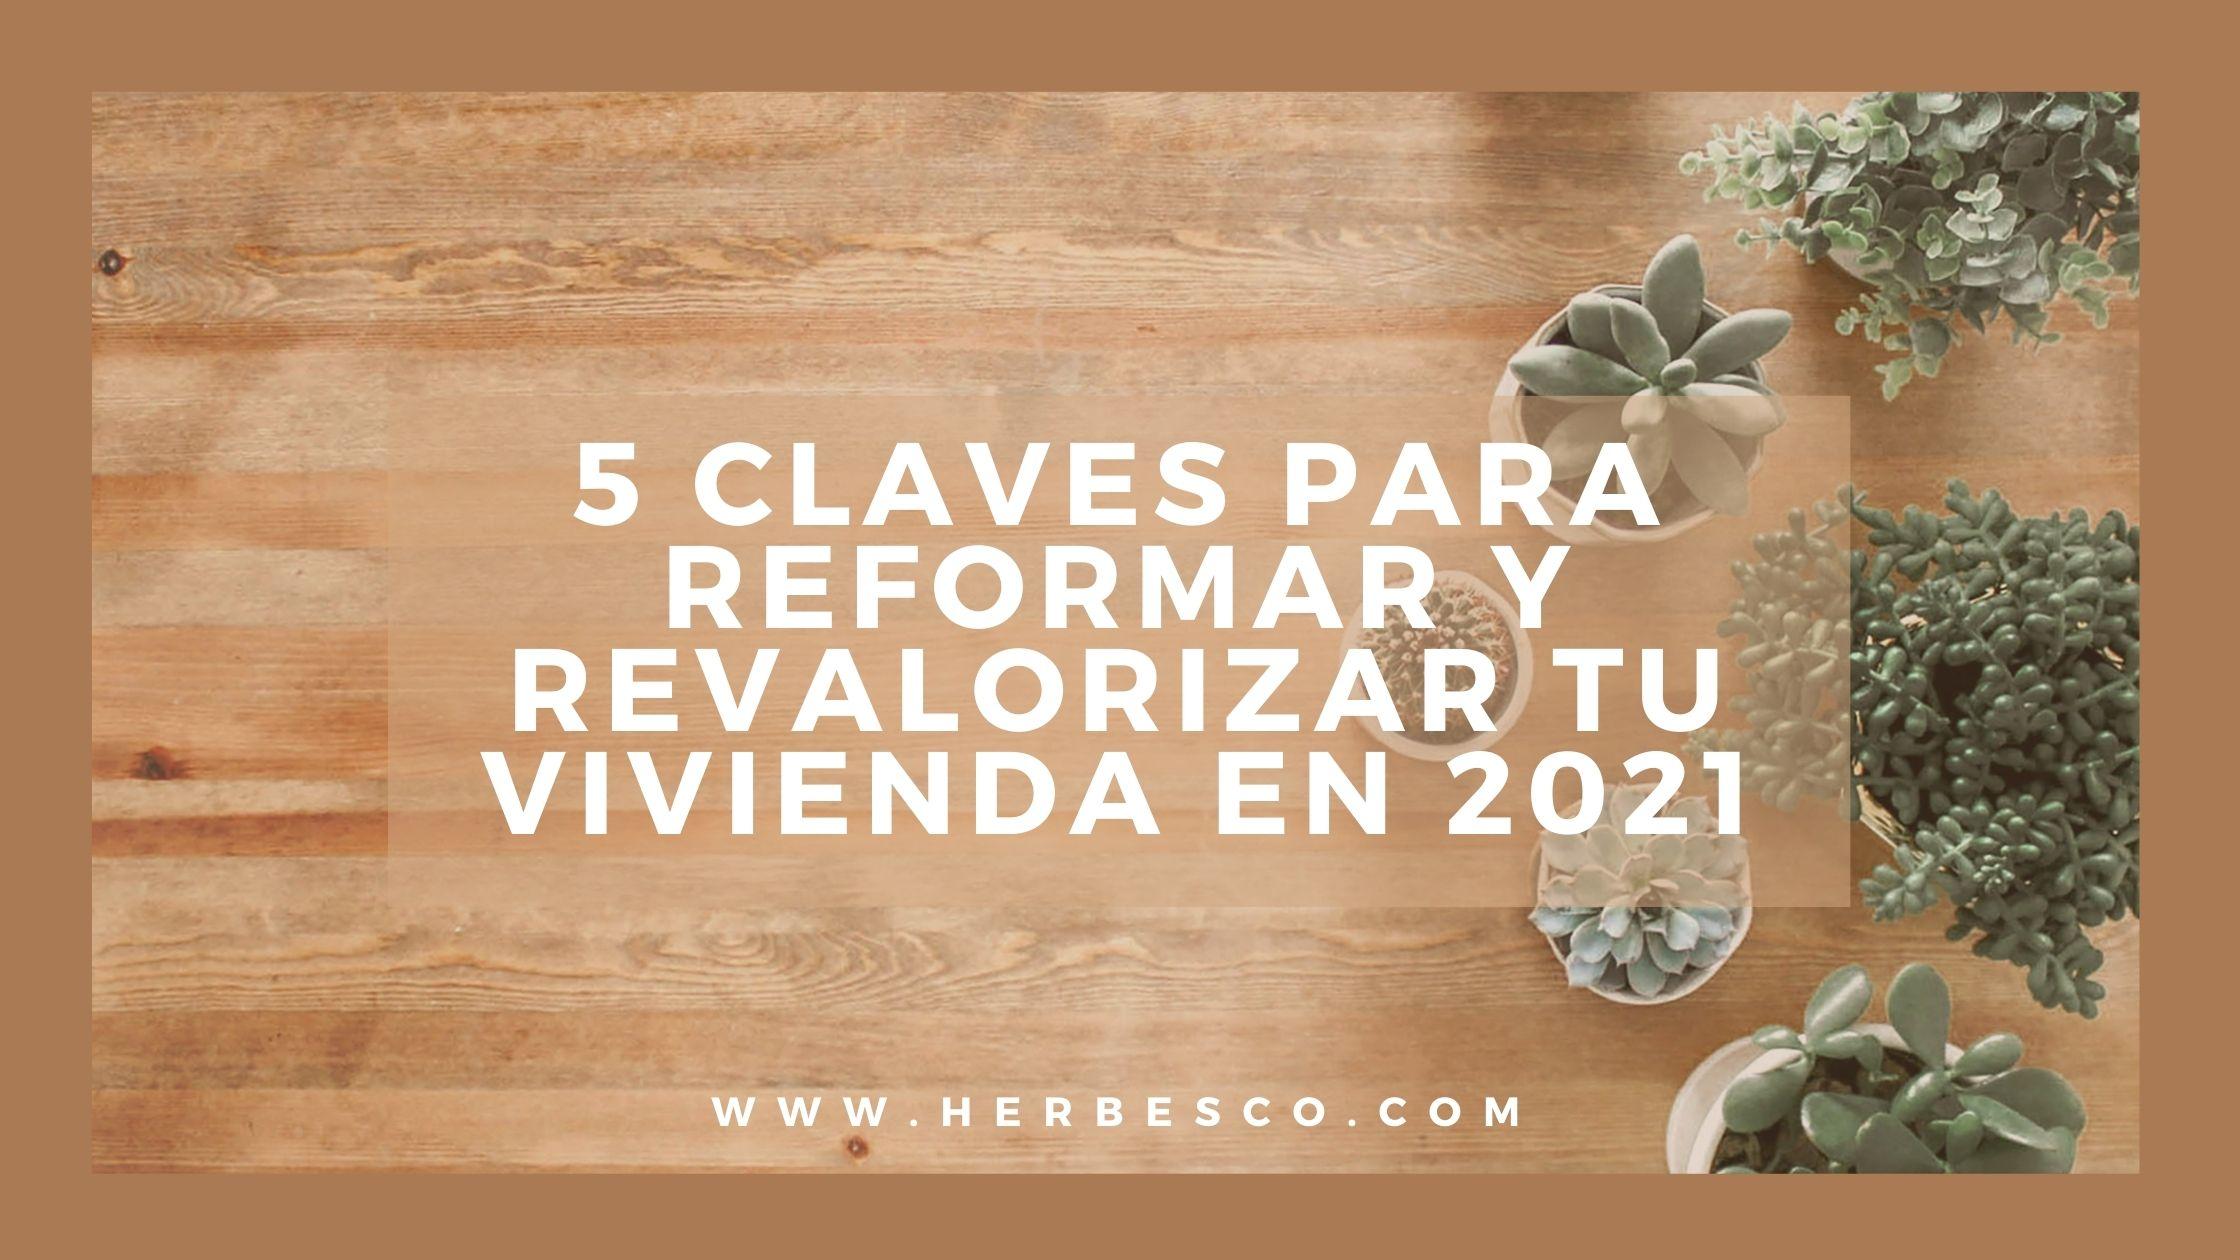 reformas-para-revalorizar-tu-vivida-las-5-claves-1